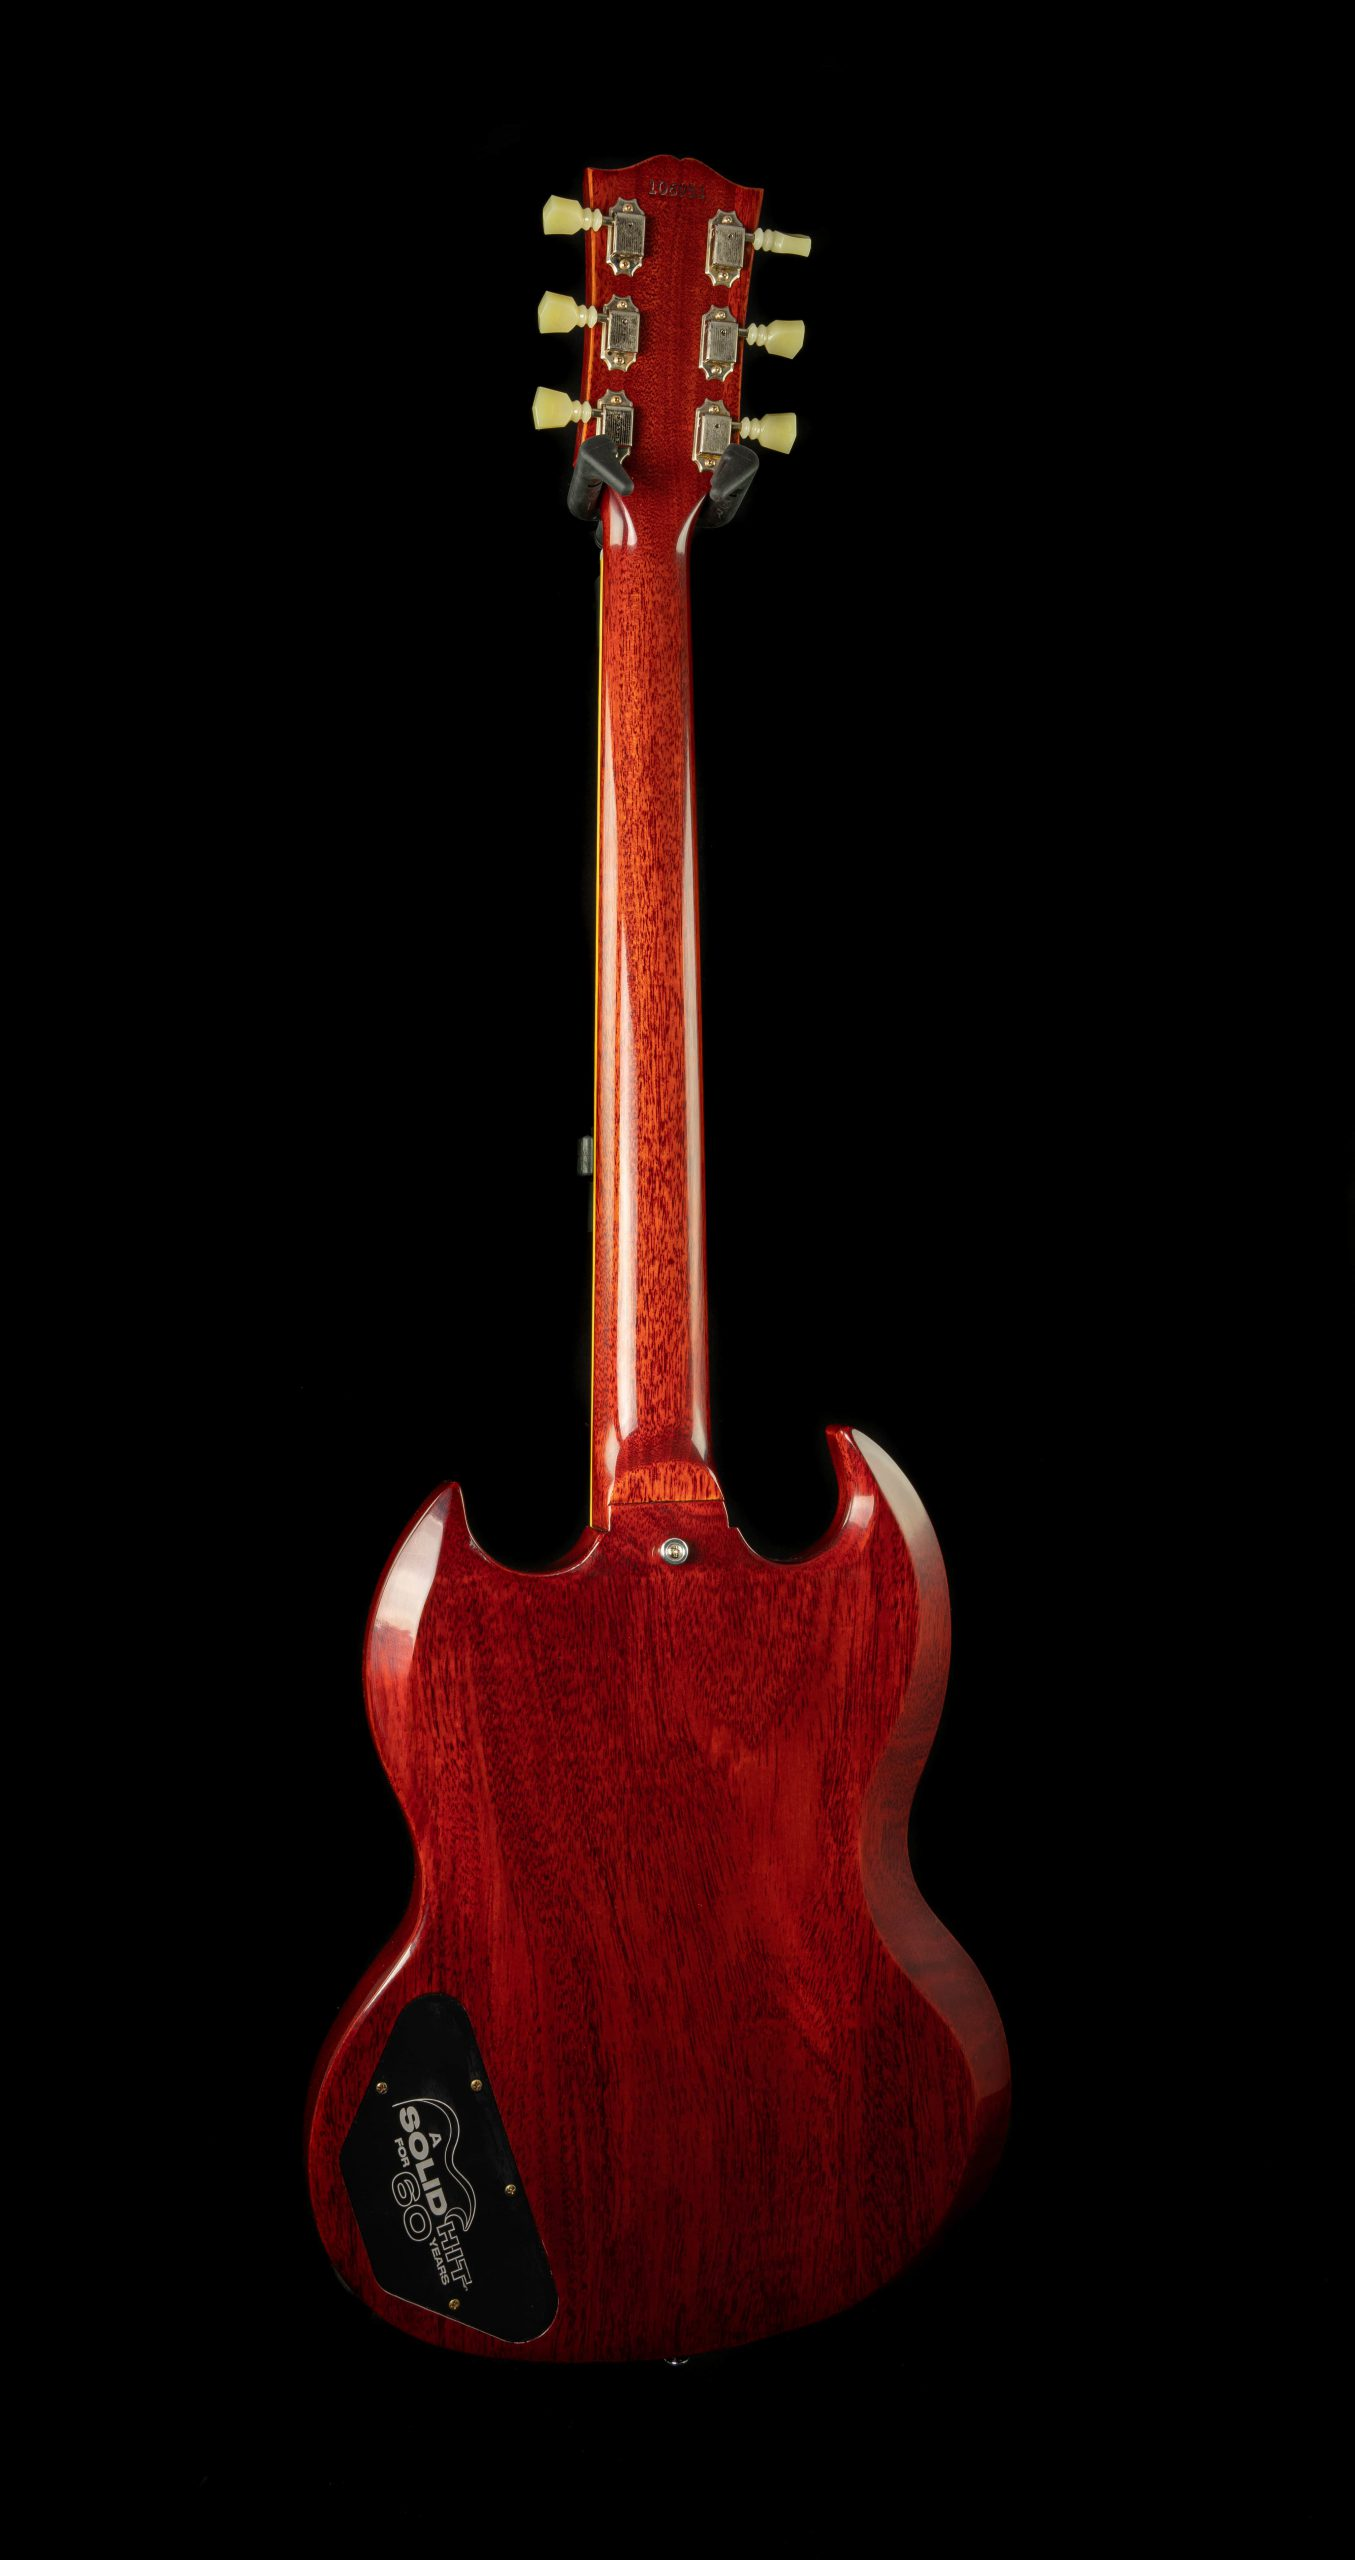 Gibson 60th Anniversary '61 Les Paul SG Standard w/ Sideways Vibrola in Cherry Red